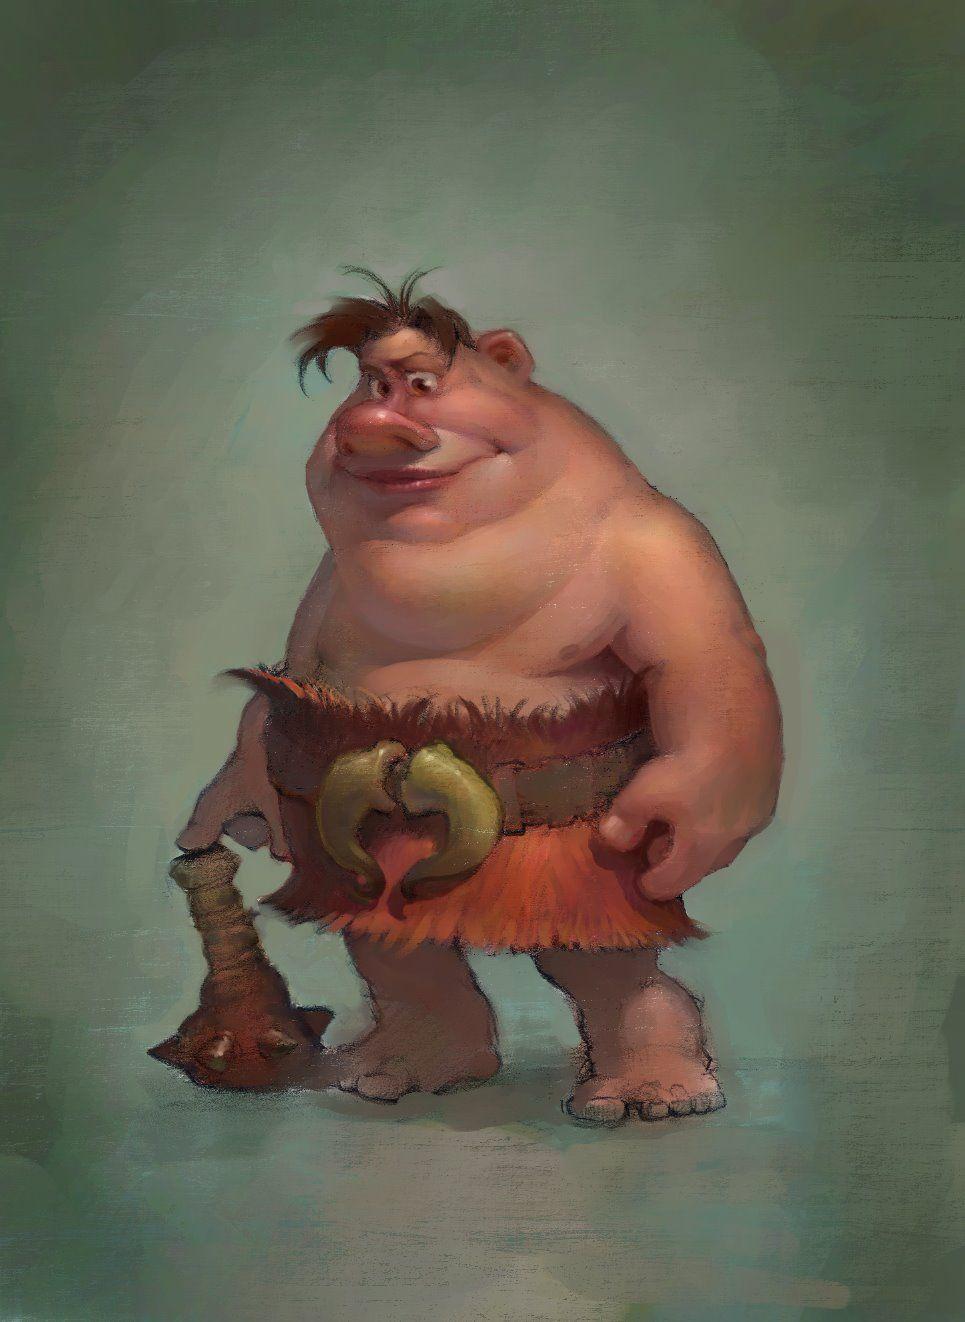 Hog Heaven - The Art of Todd Harris